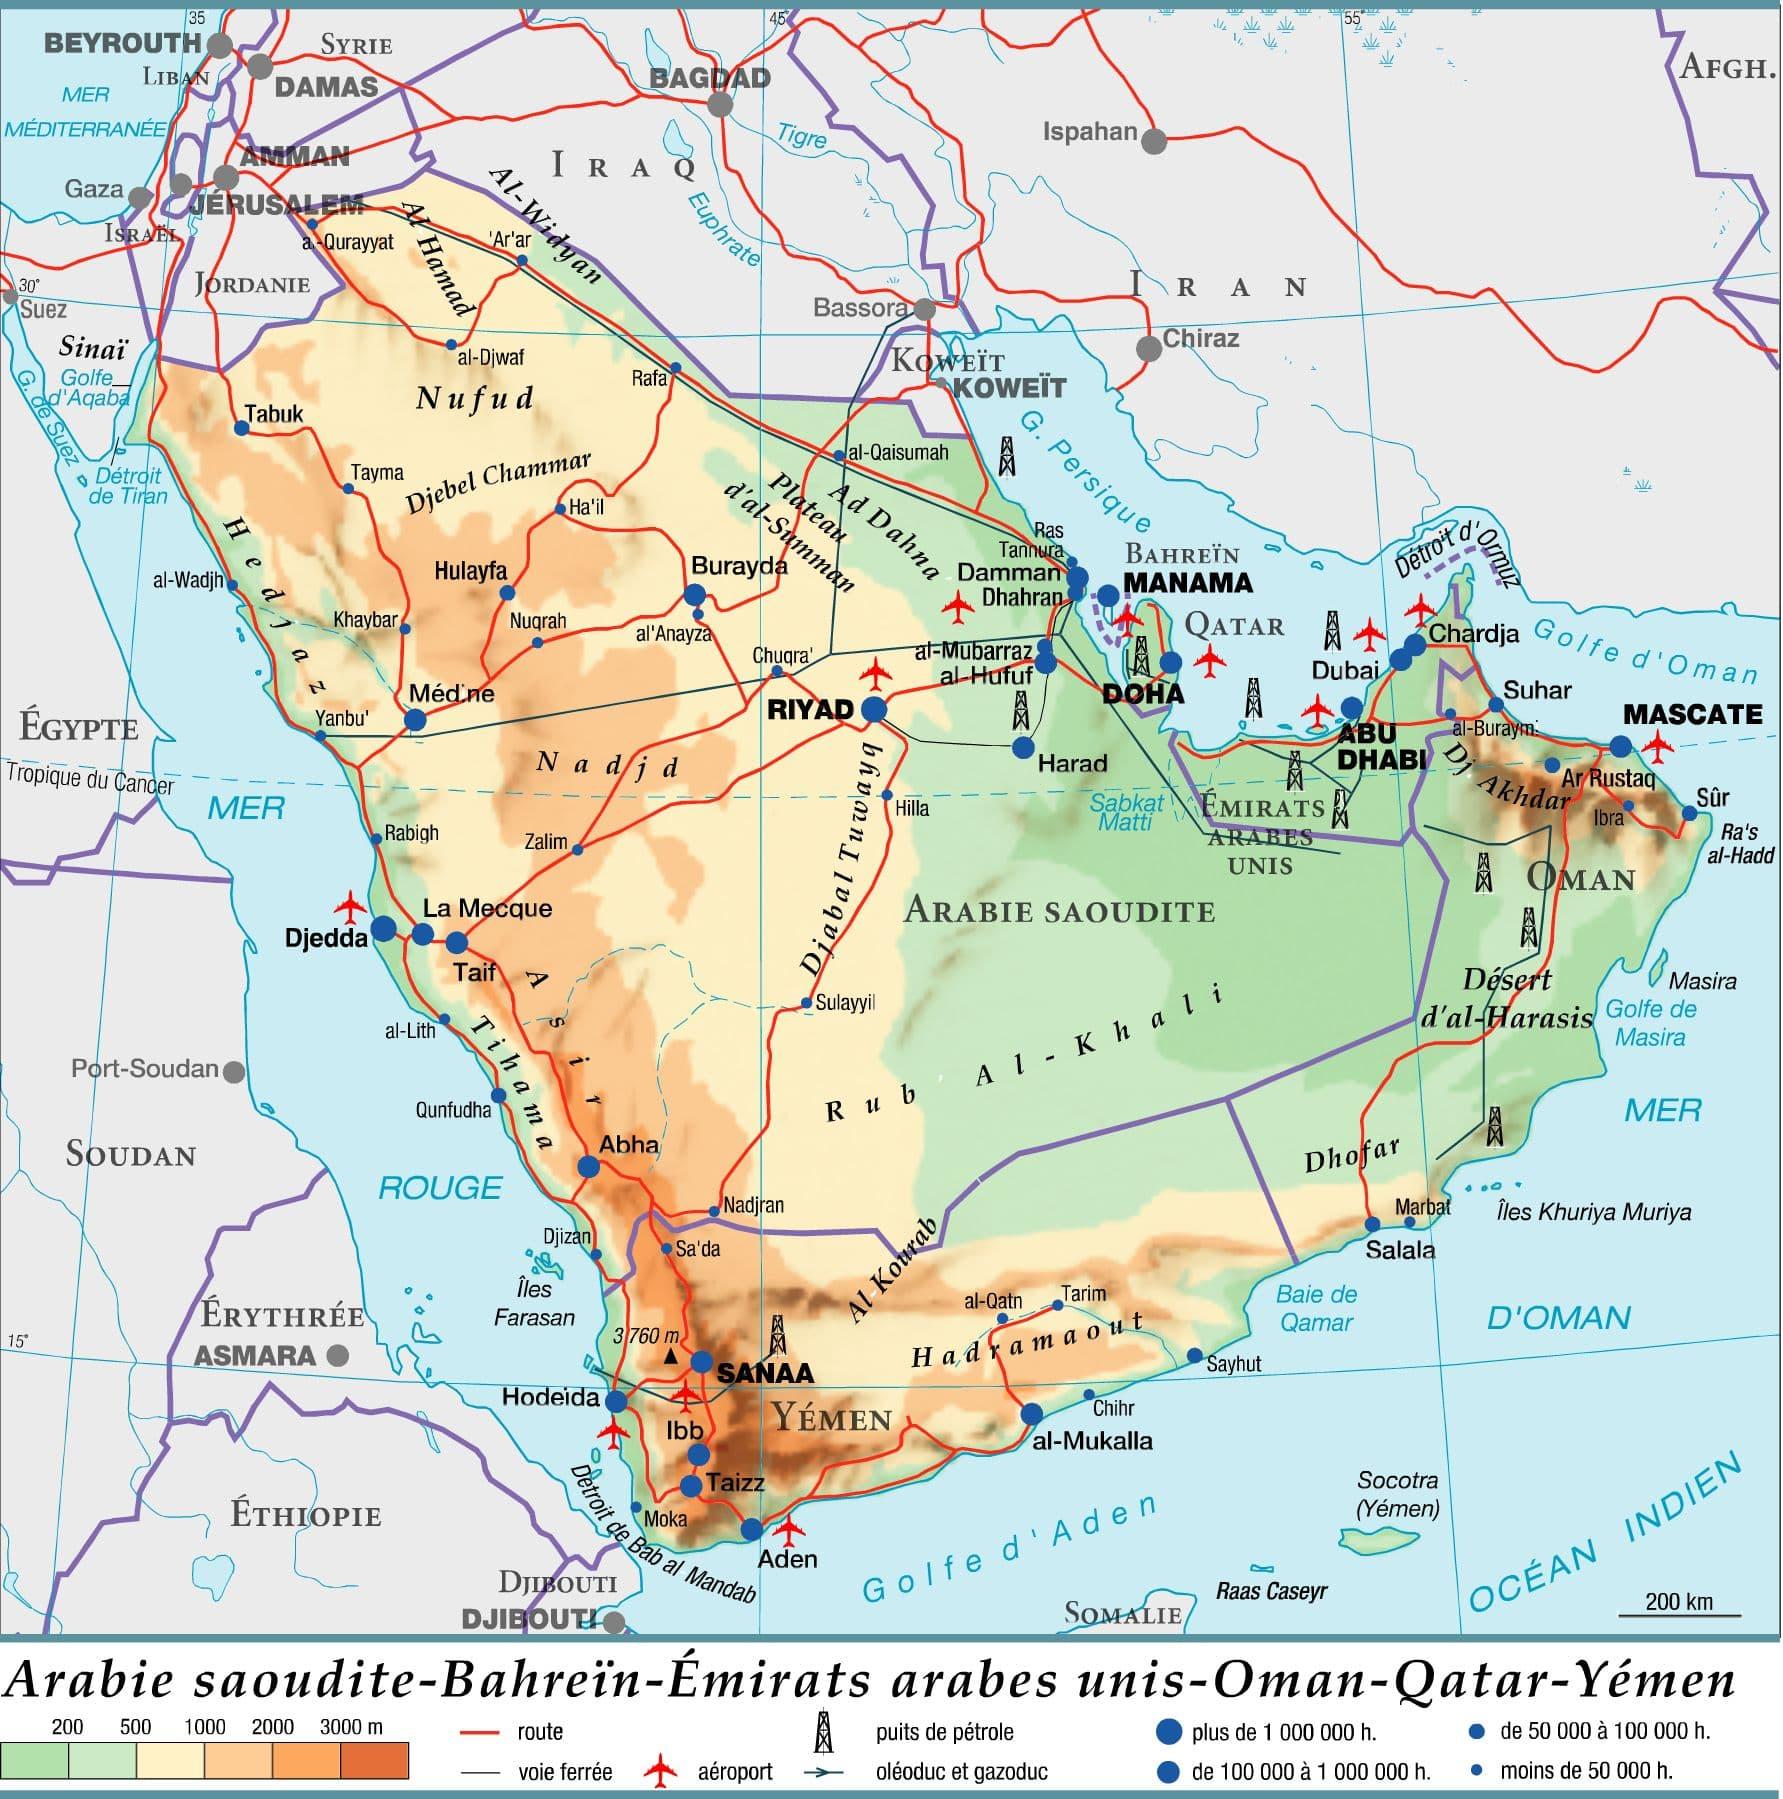 Arabie saoudite - Bahreïn - Émirats arabes unis - Oman - Qatar - Yémen